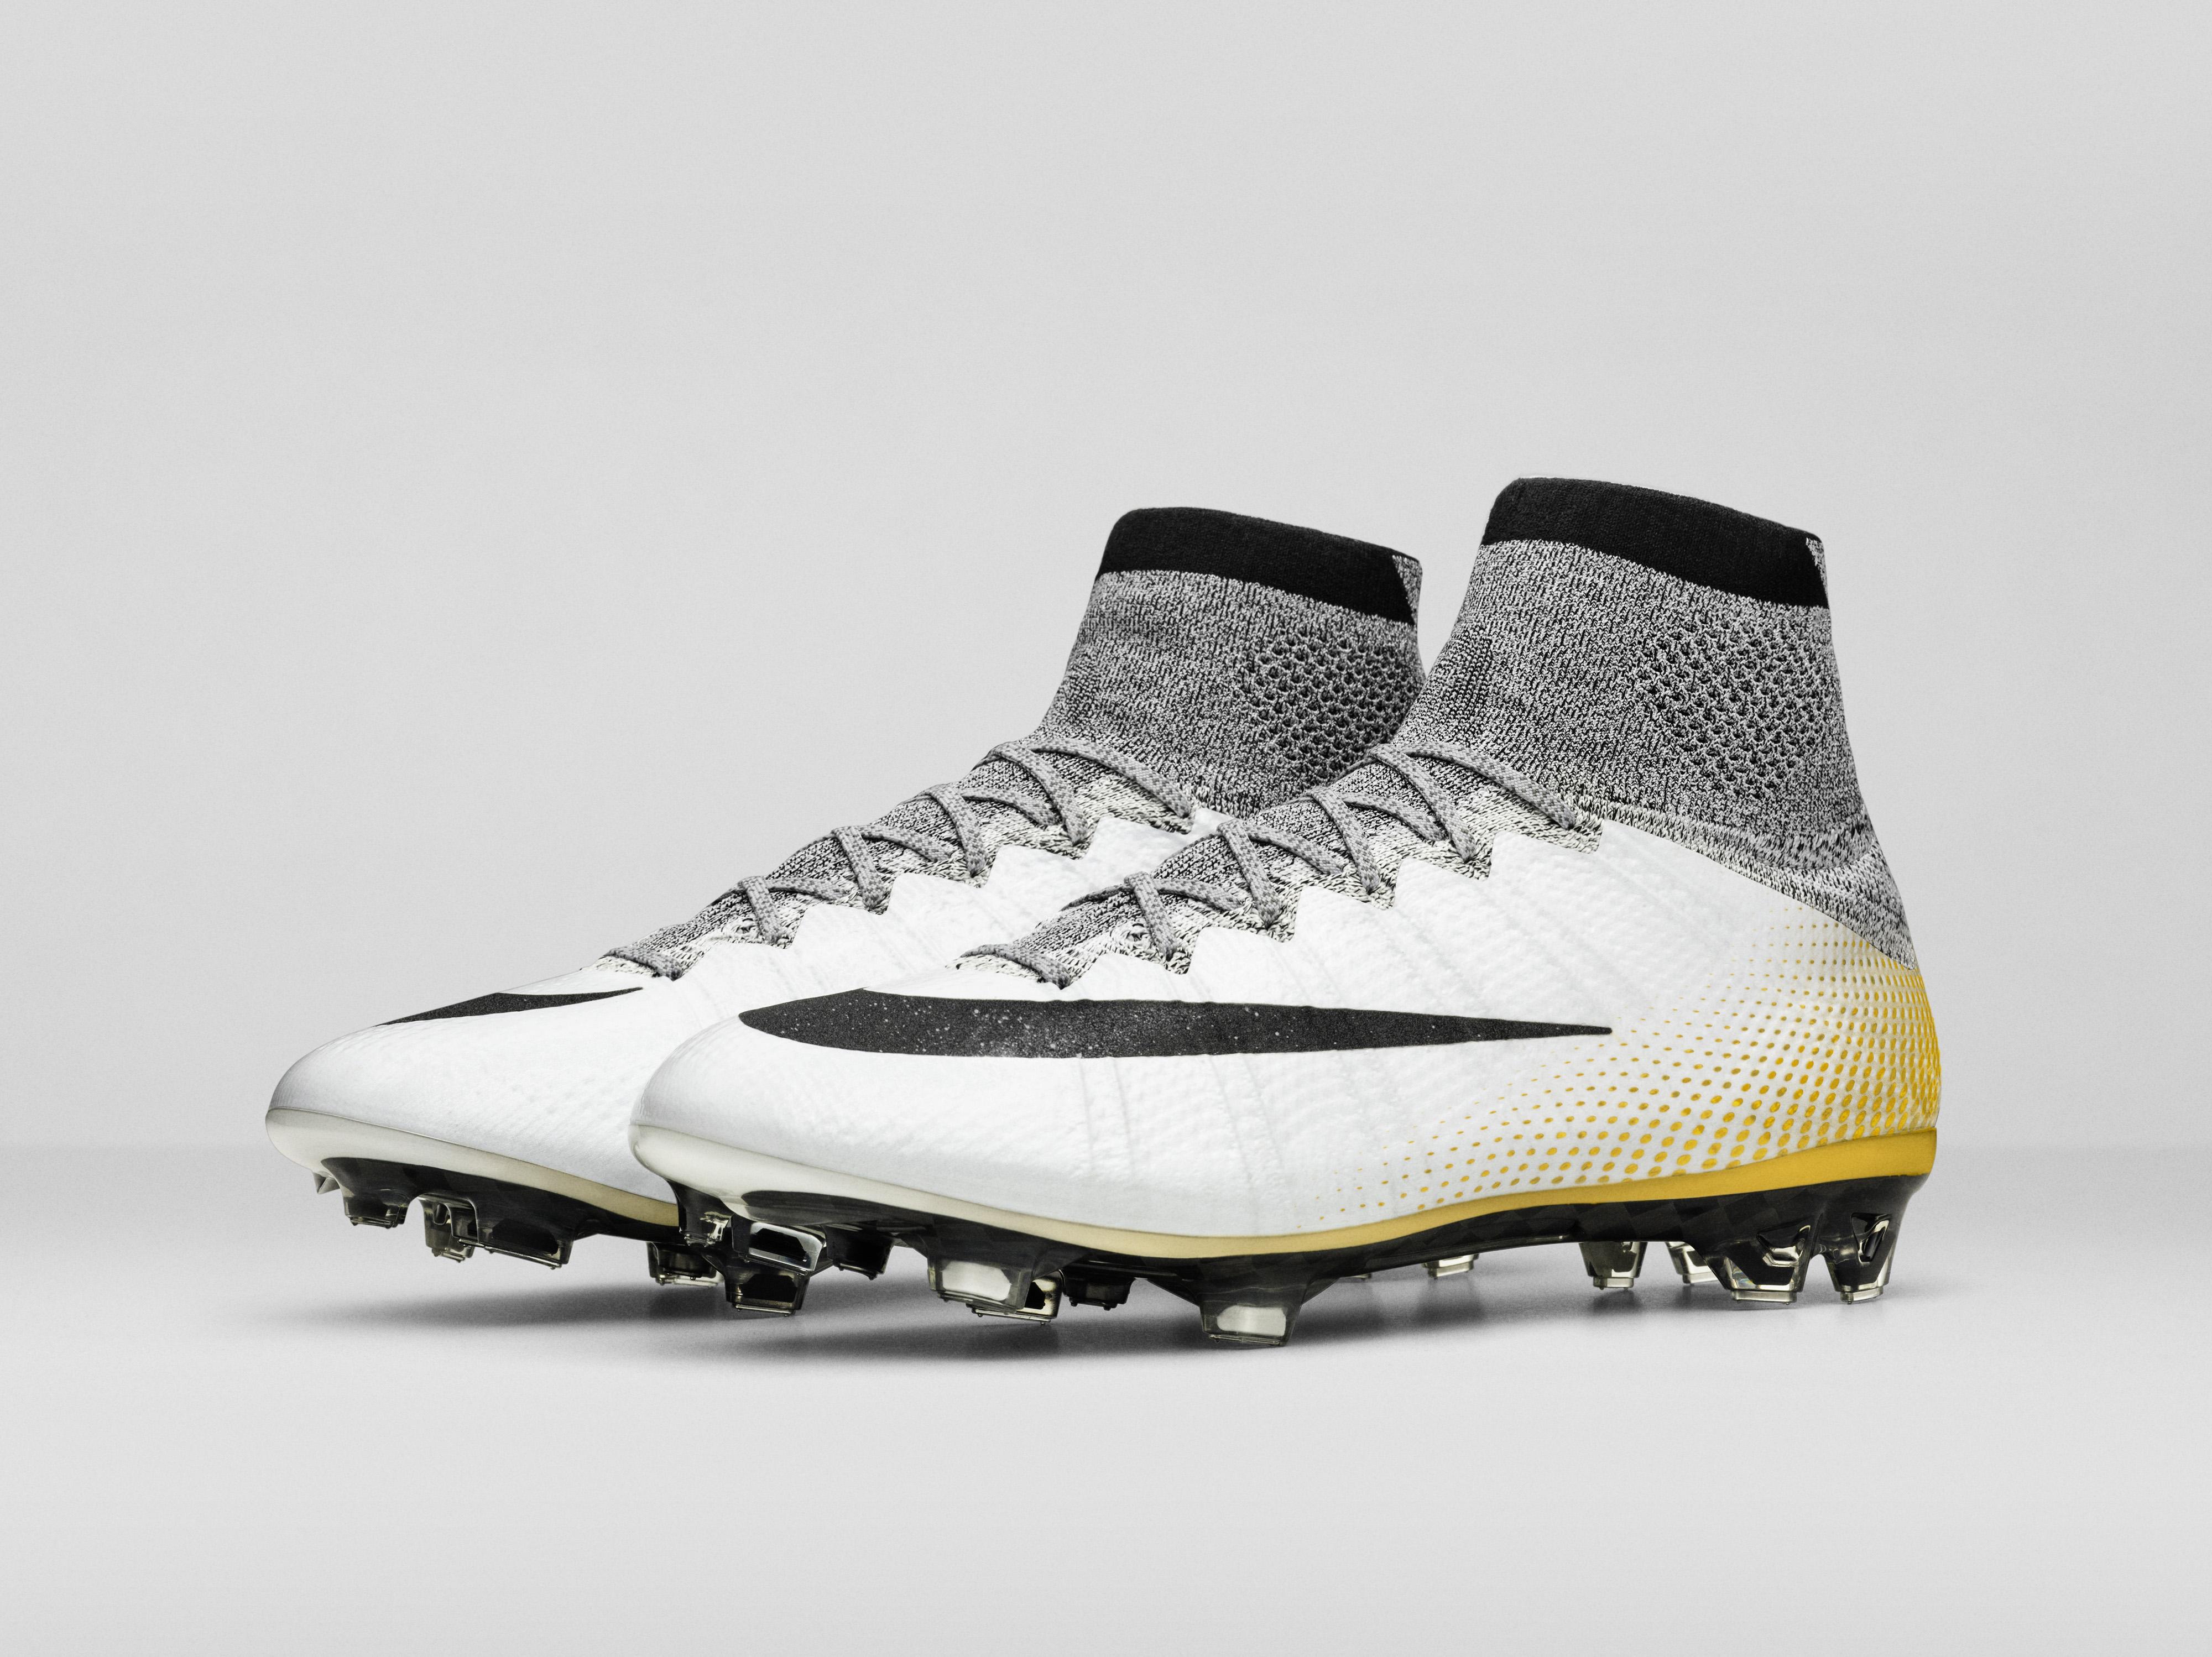 Nike Mercurial Superfly speciali per CR7